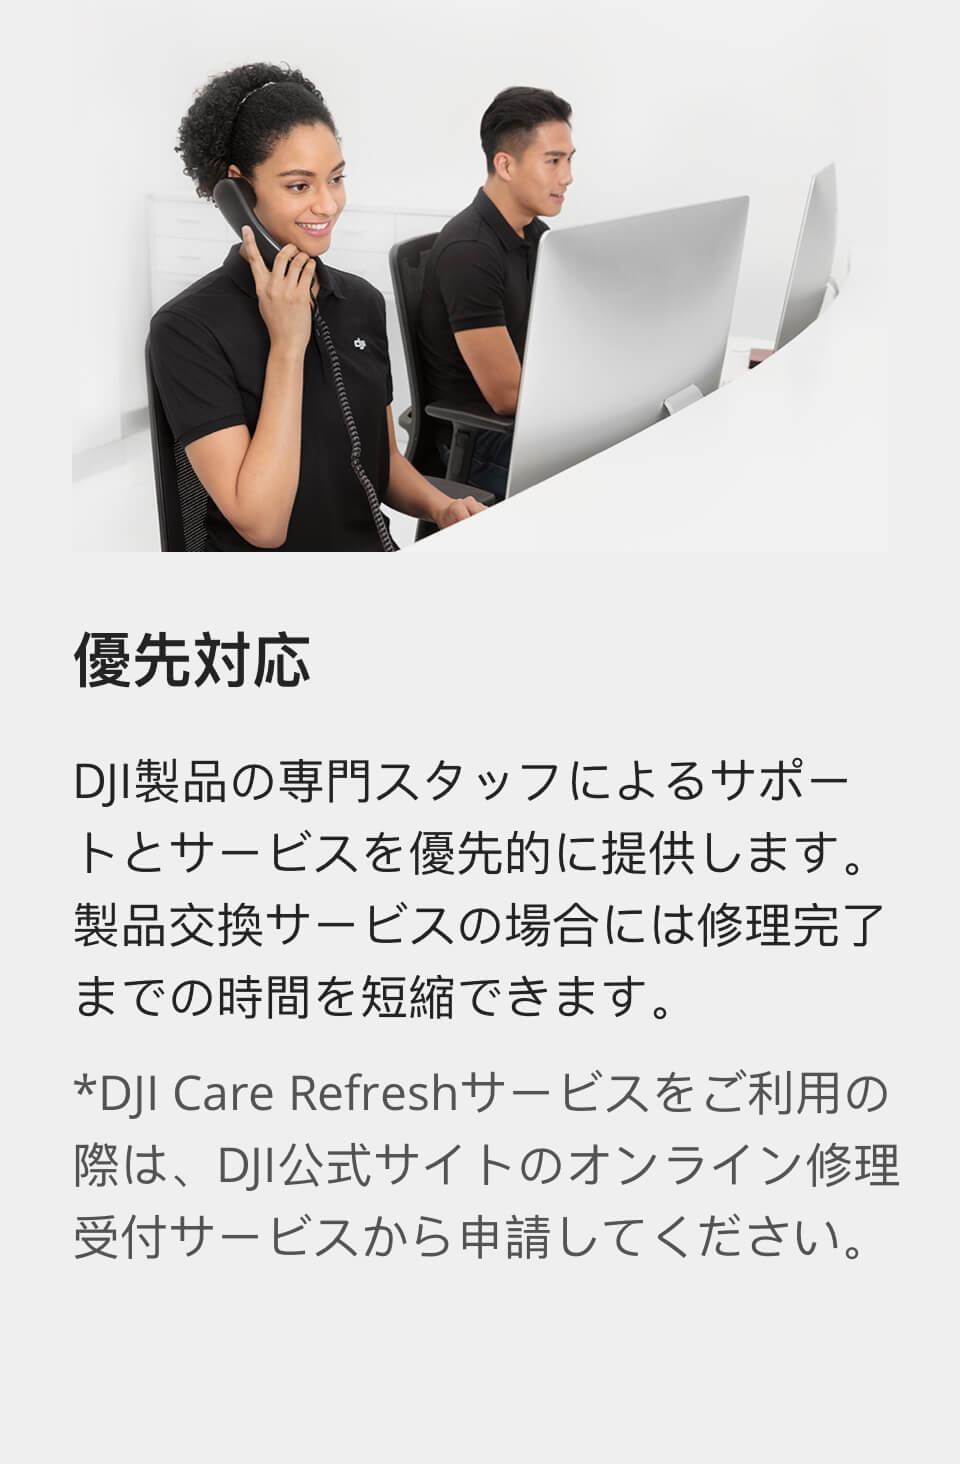 DJI Care Refresh (DJI OM 4) | 優先対応